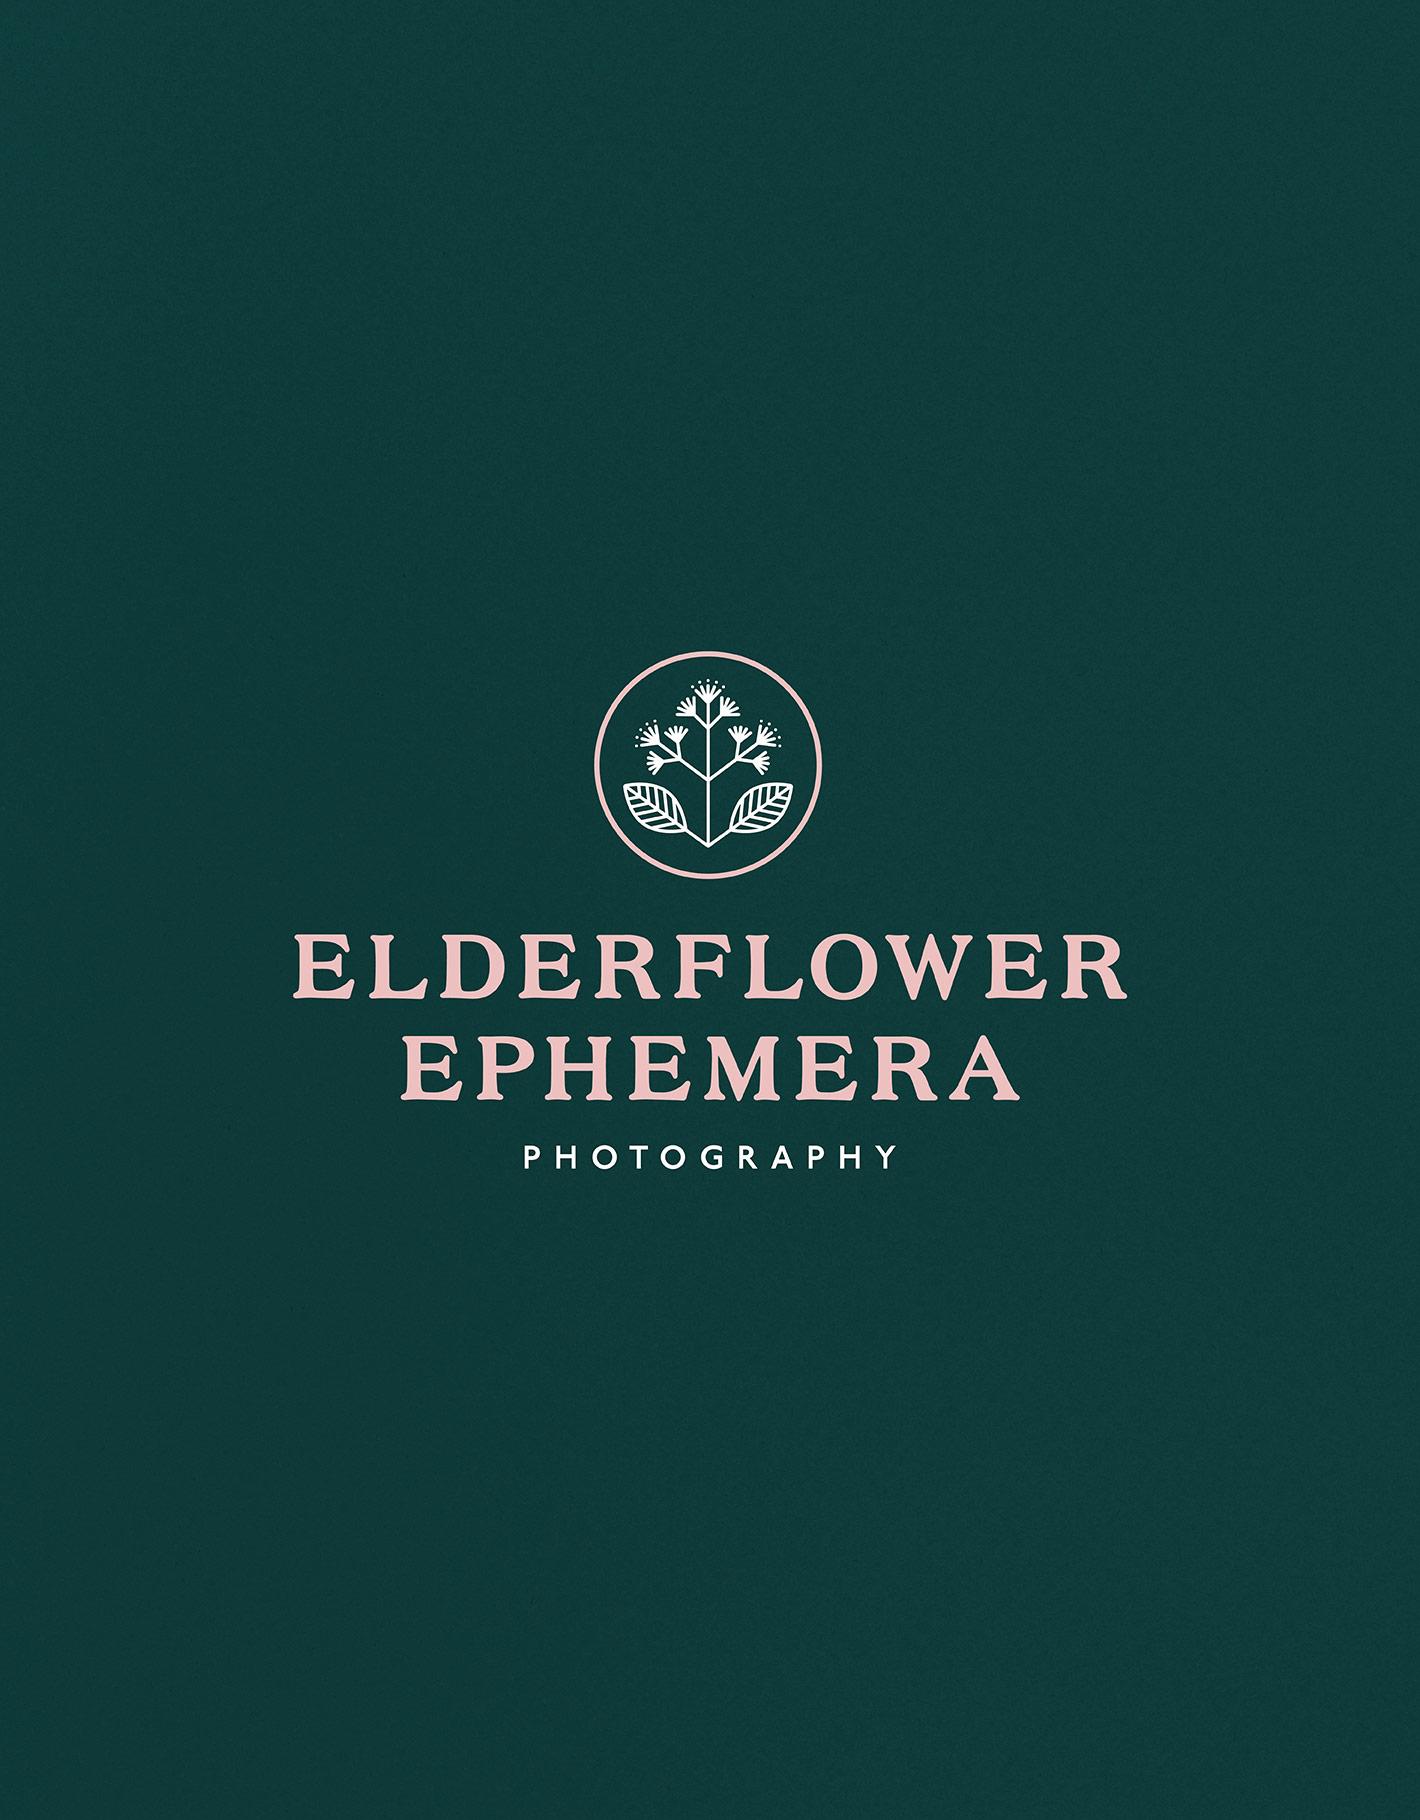 Floral icon and serif logotype for elderflower ephemera